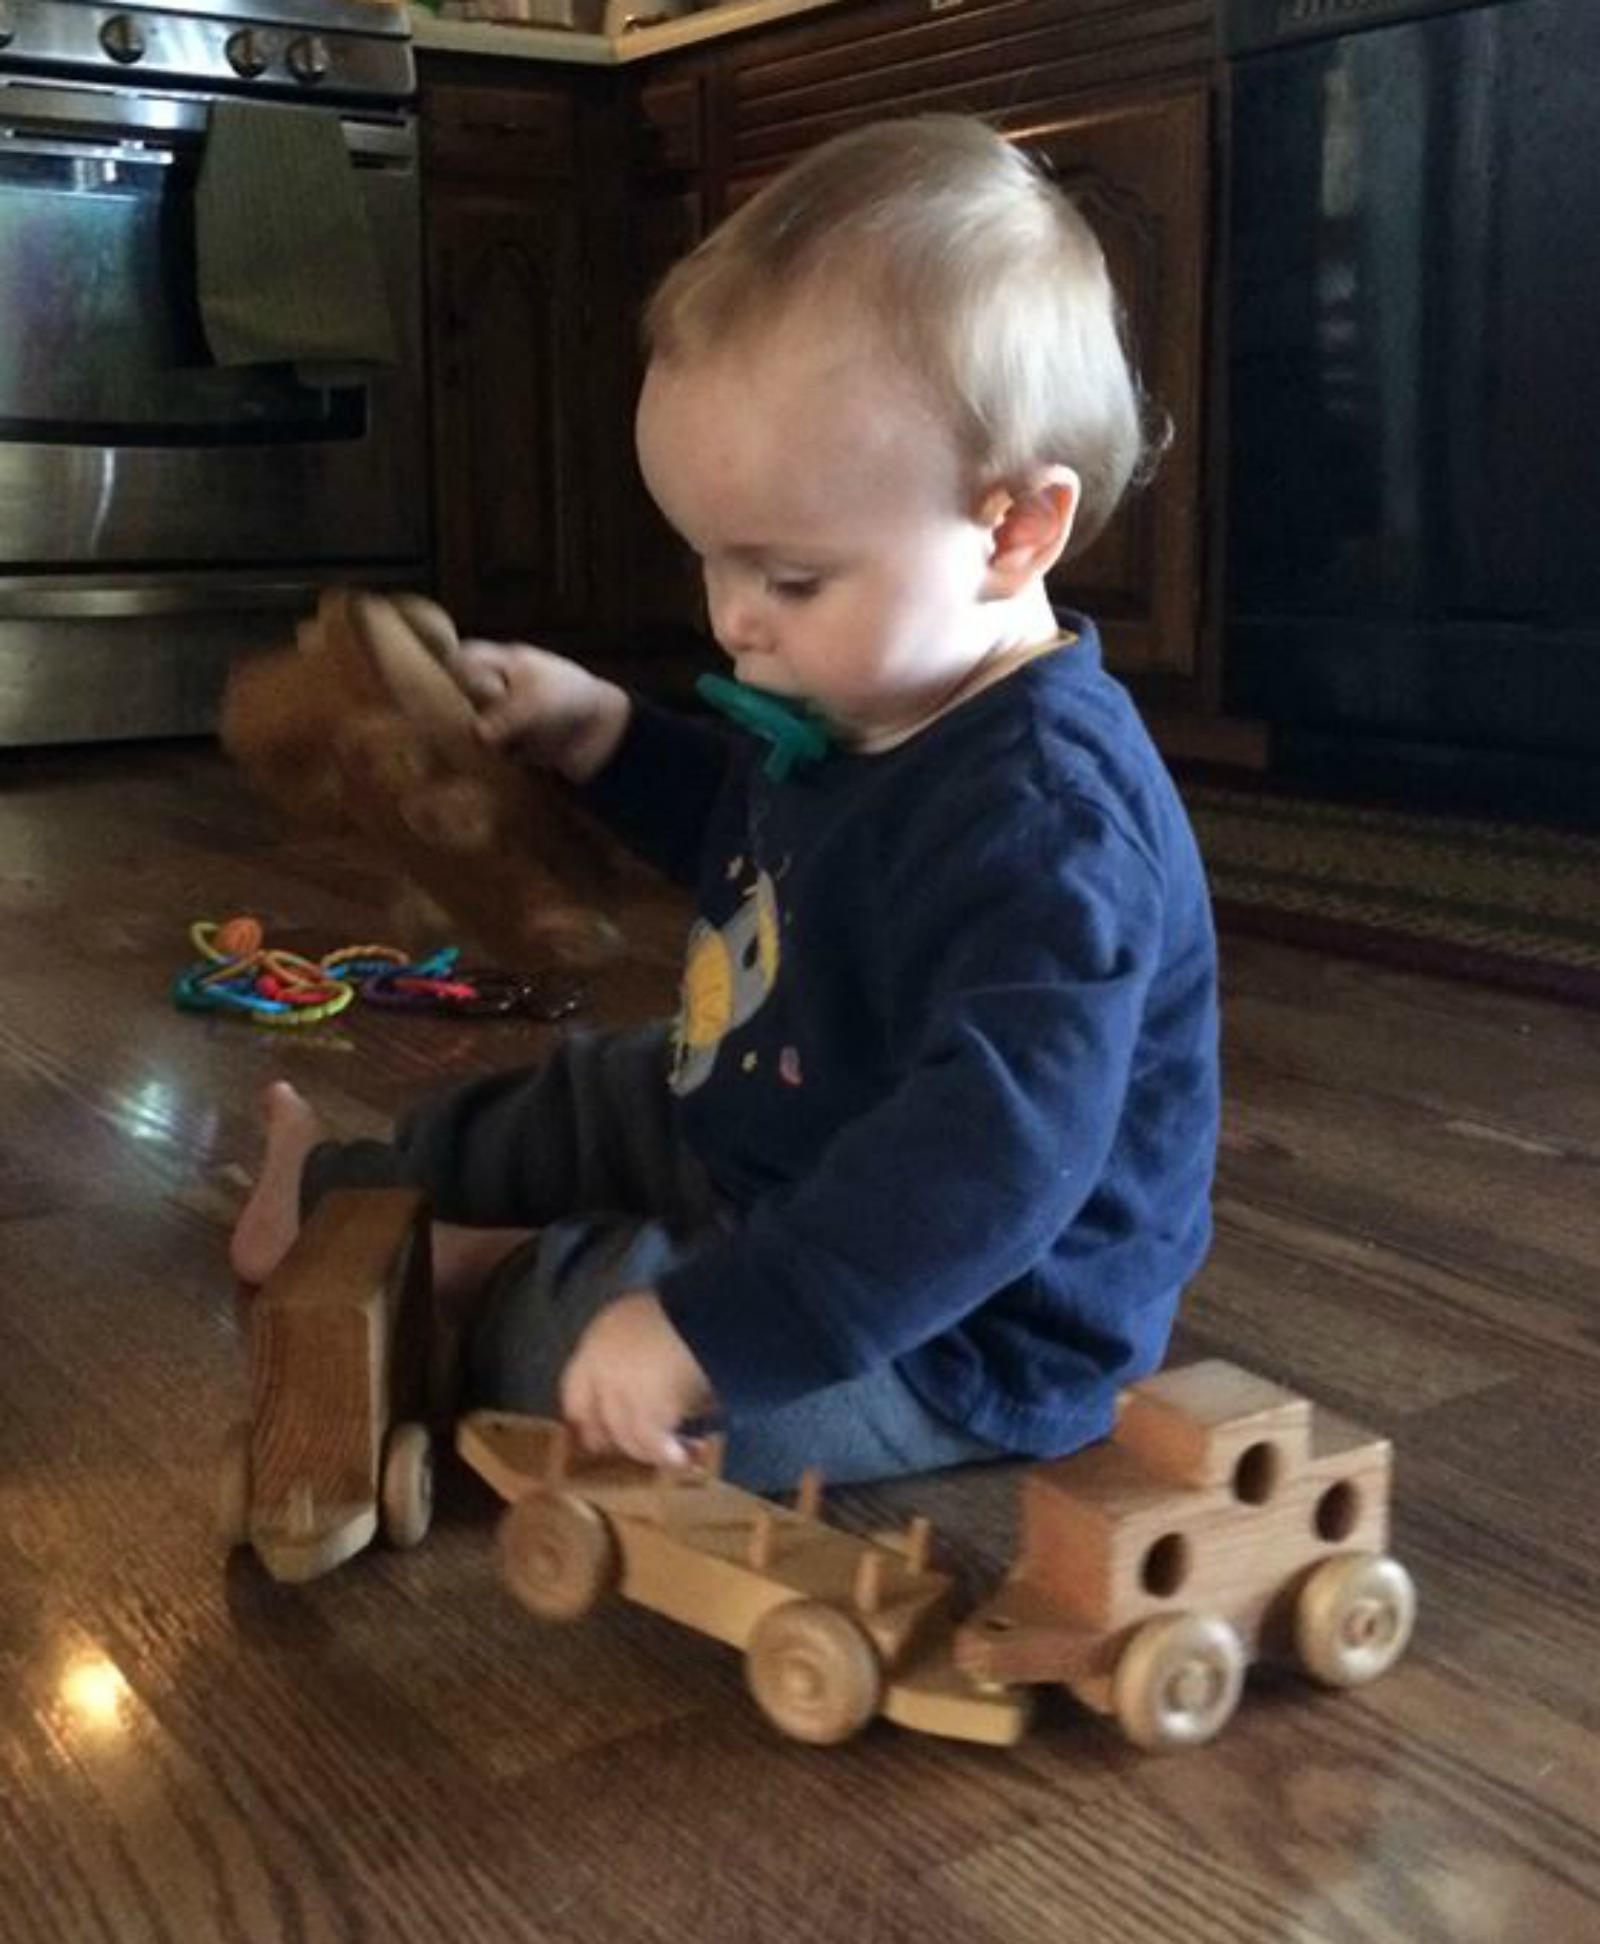 grandchildren, thanksgiving traditions